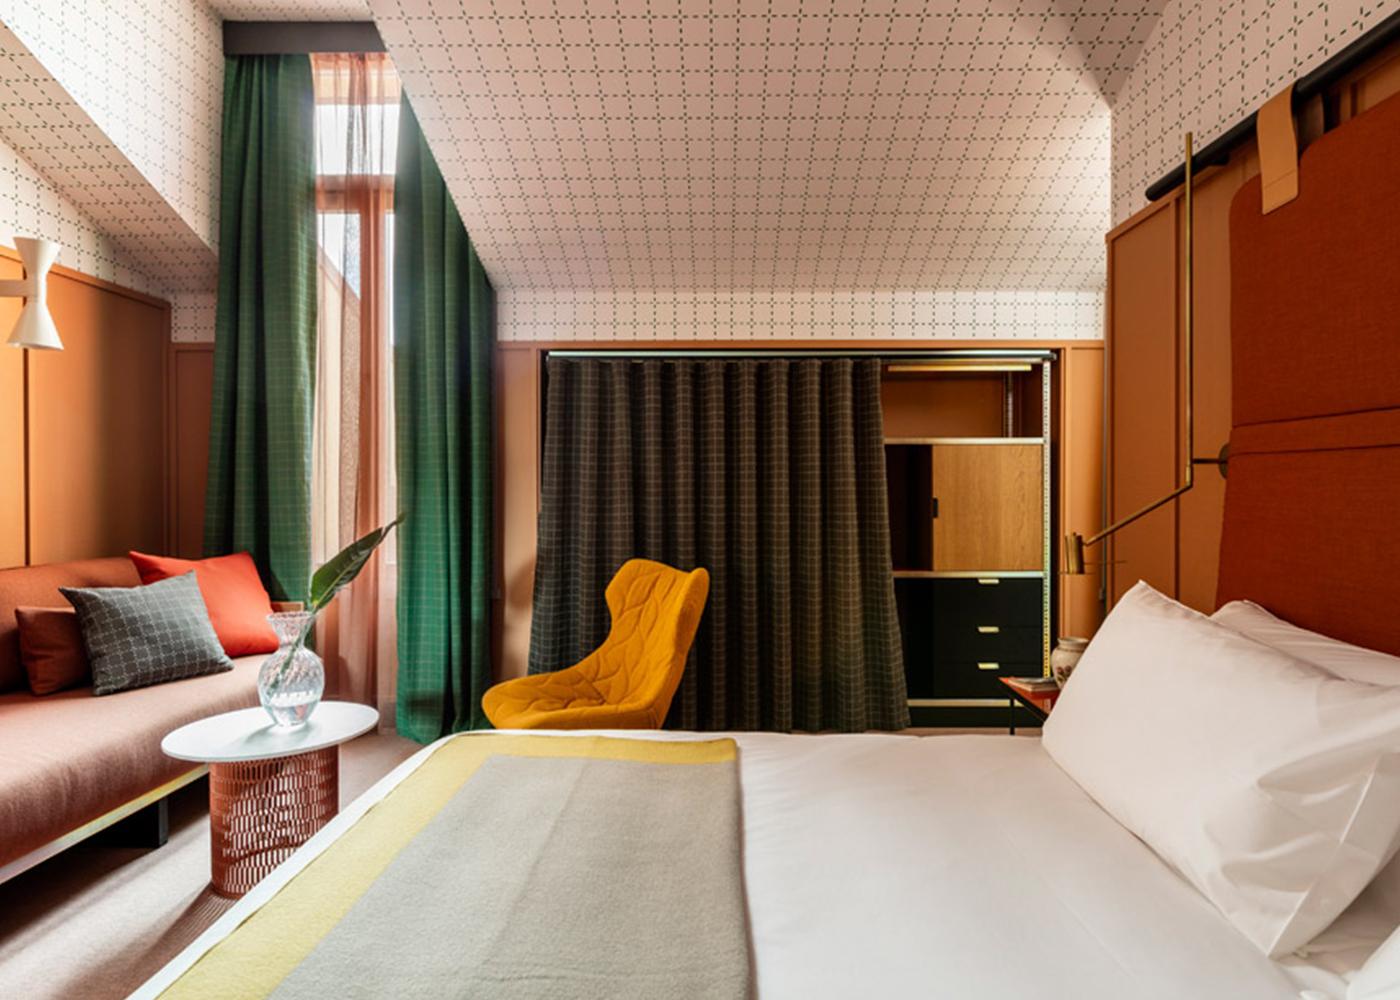 patricia-urquiola-room-mate-hotels-interior-design-milan_dezeen_936_9